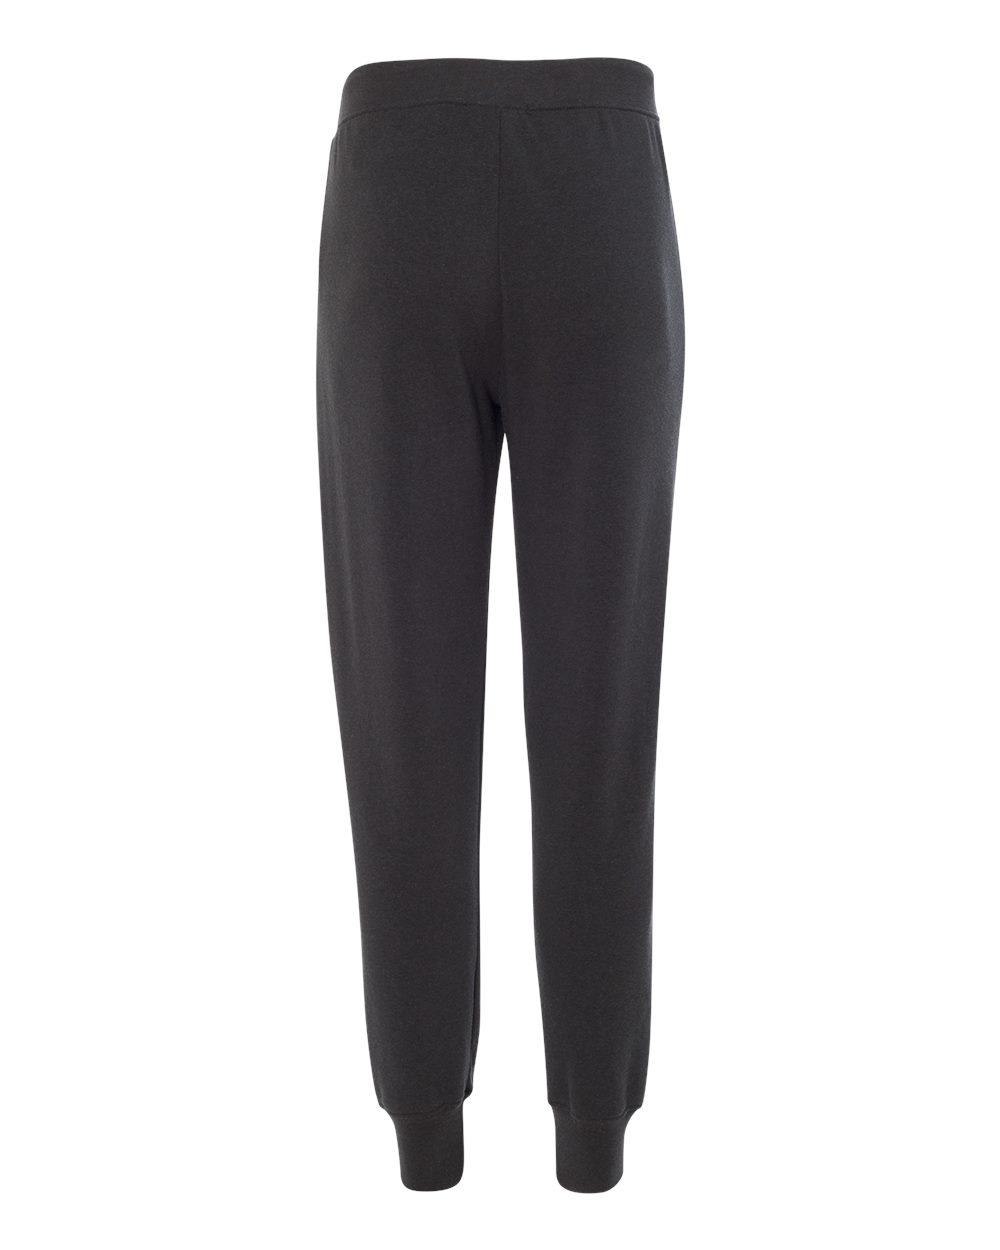 Alternative-Mens-Eco-Fleece-Dodgeball-Pants-Sweatpants-Pocket-9881-up-to-2XL thumbnail 16